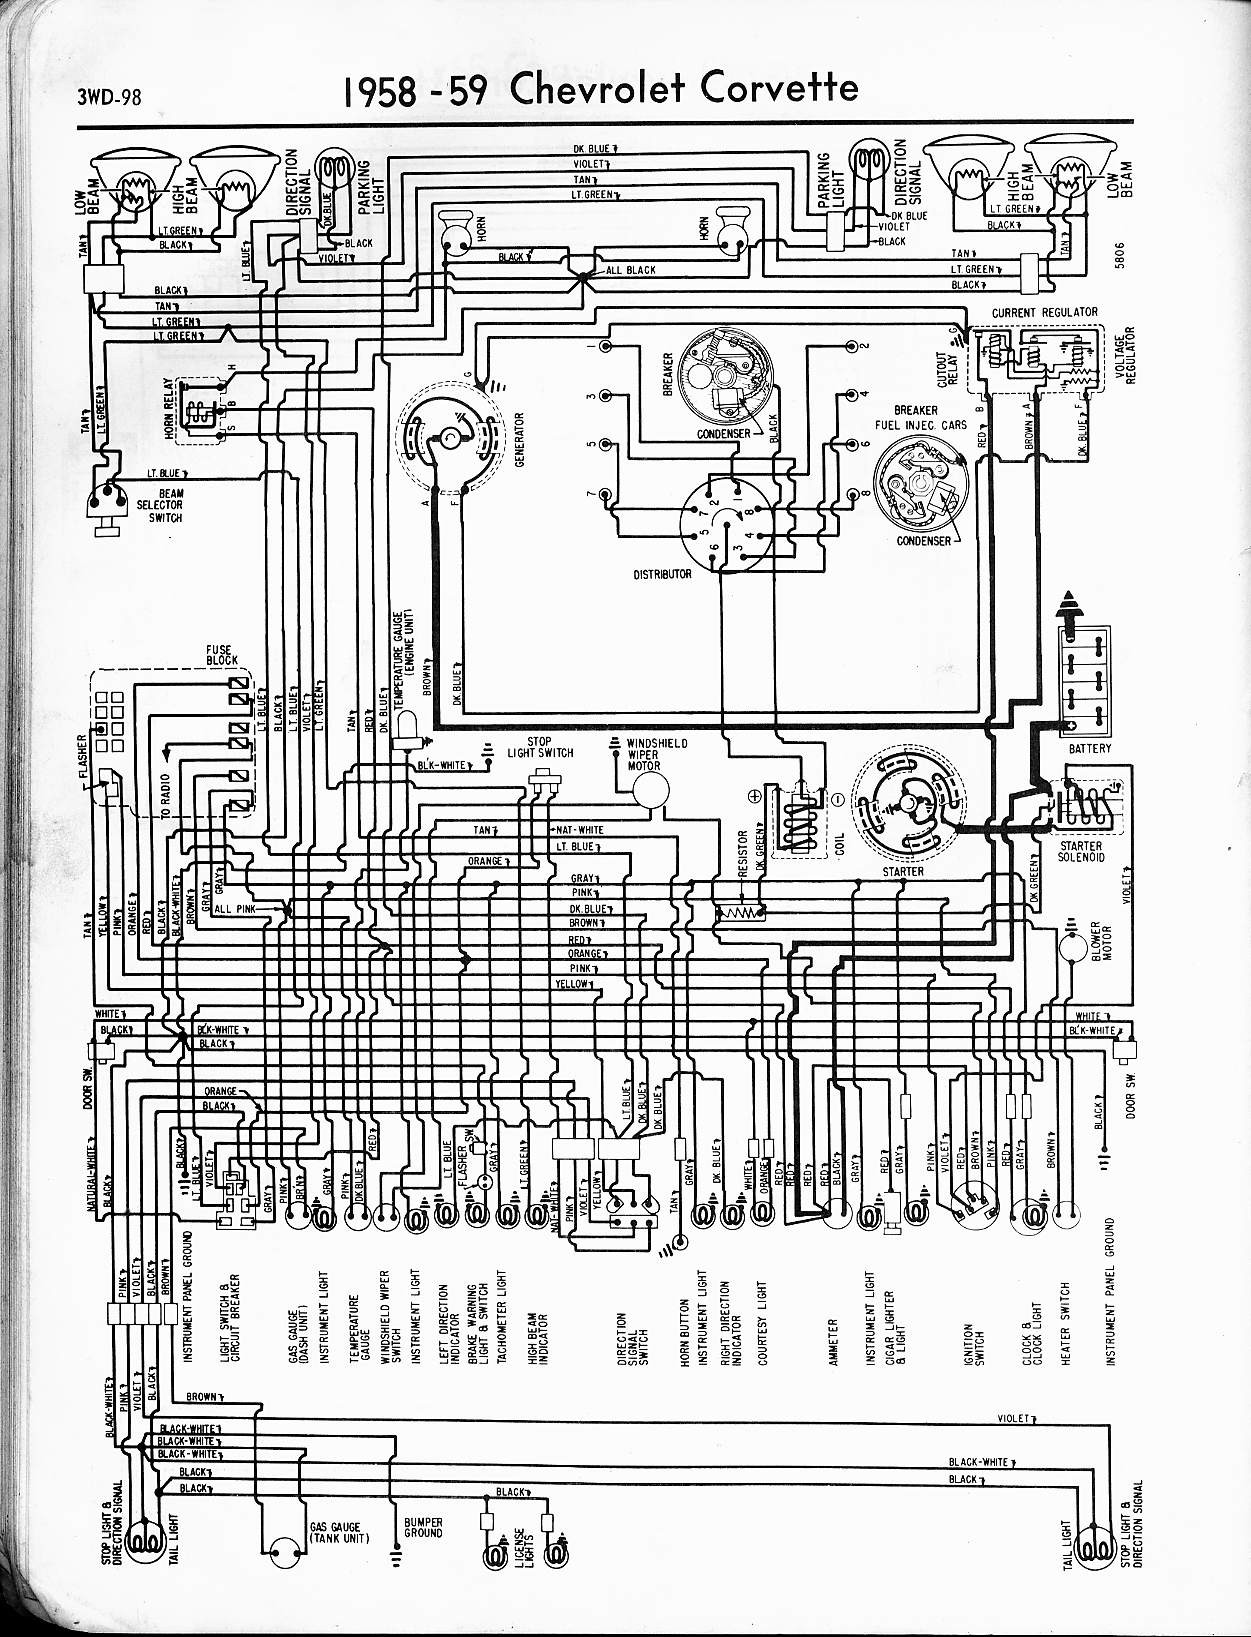 hight resolution of 1979 corvette wiring diagram 57 65 chevy wiring diagrams my wiring rh detoxicrecenze com 1979 k5